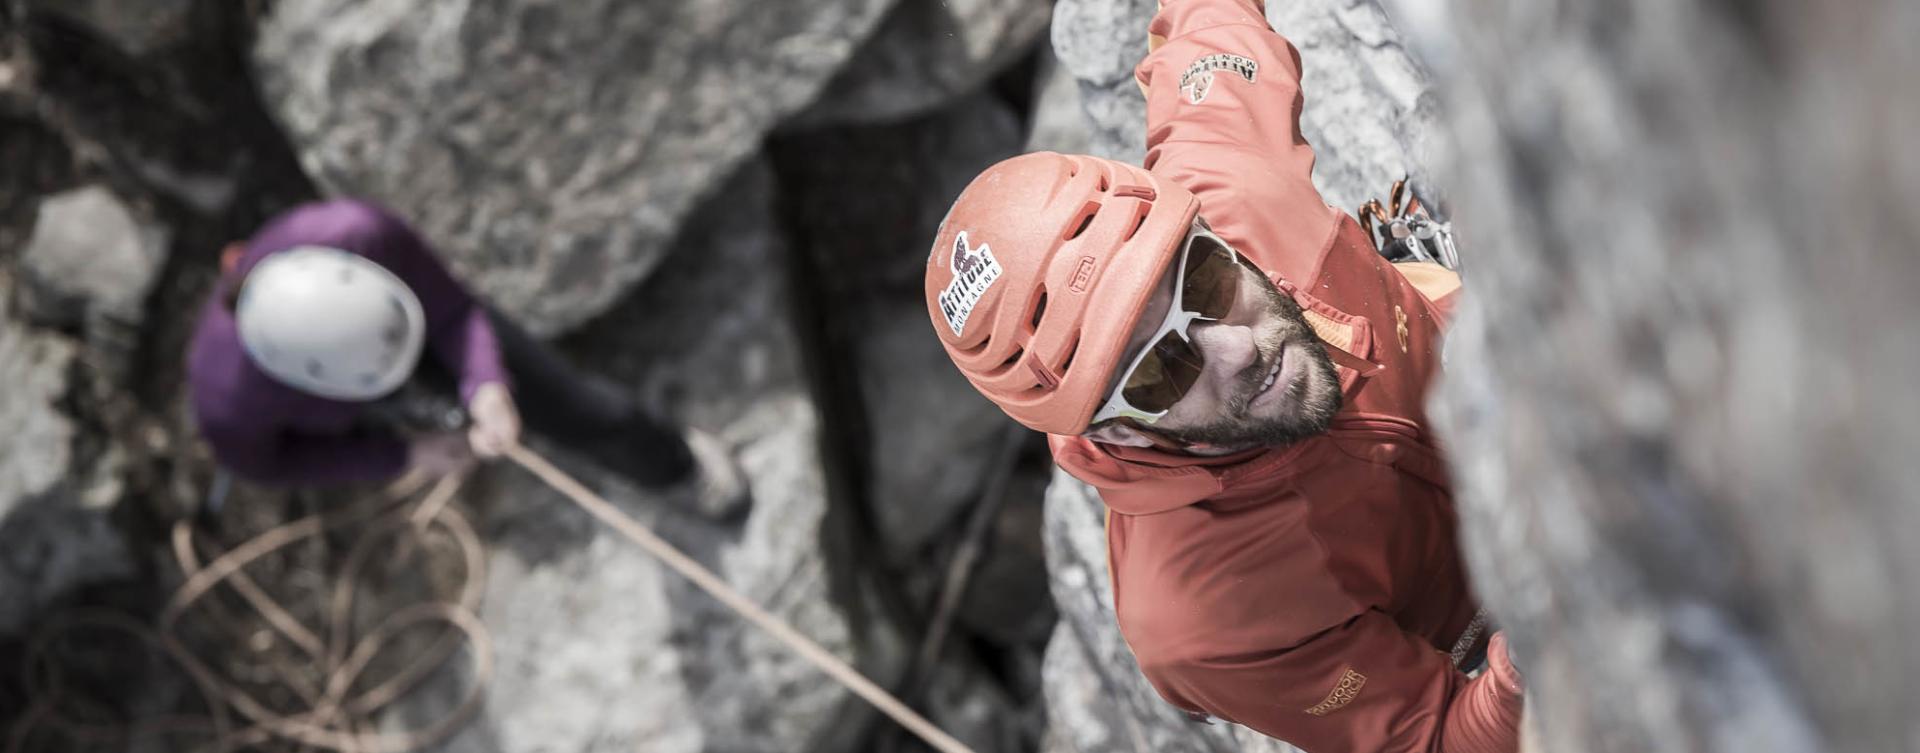 Cours d'escalade à Squamish